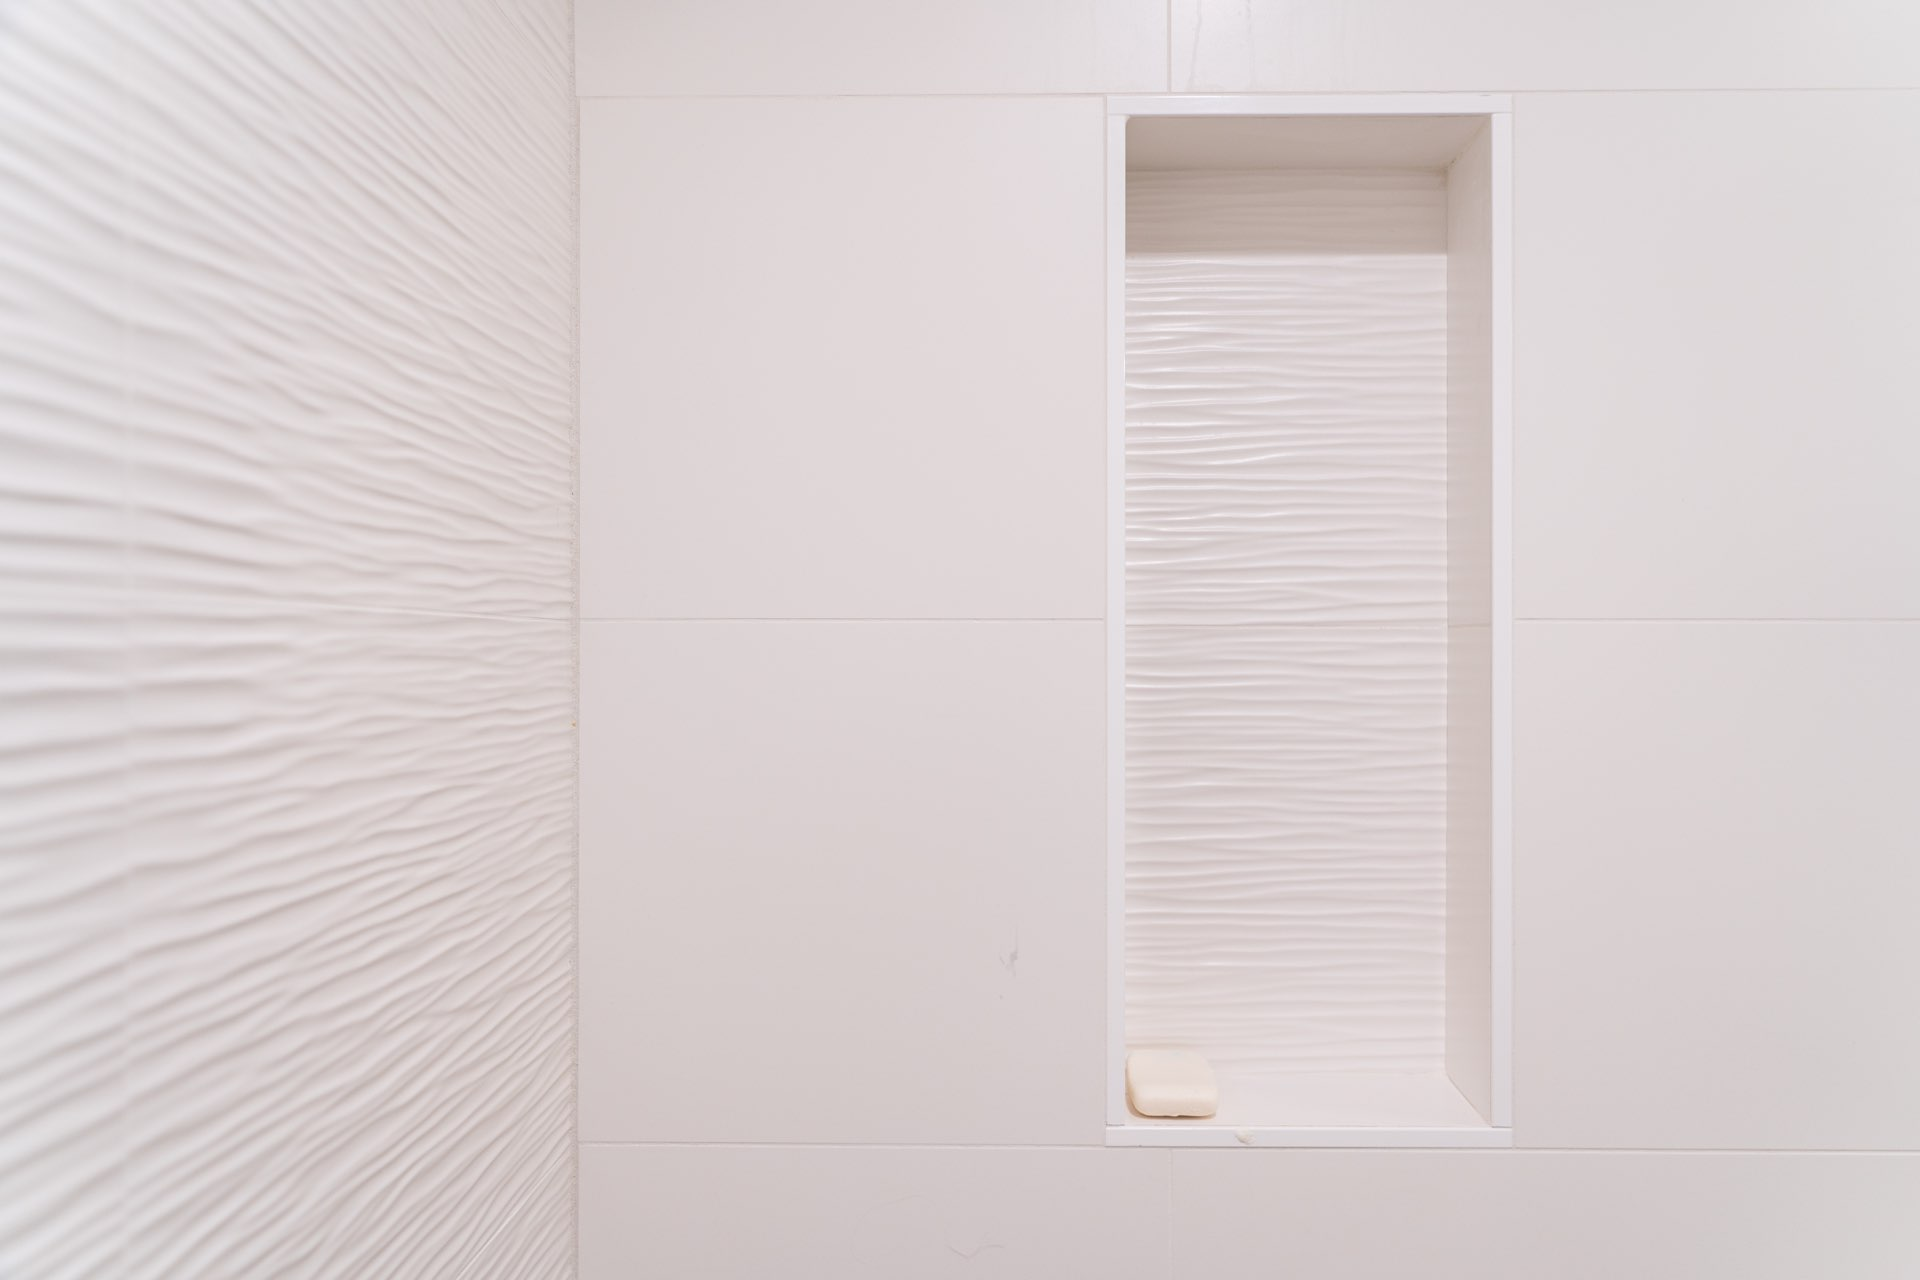 Shower detail, Larkspur Residence, architectural design by Elliott Workgroup